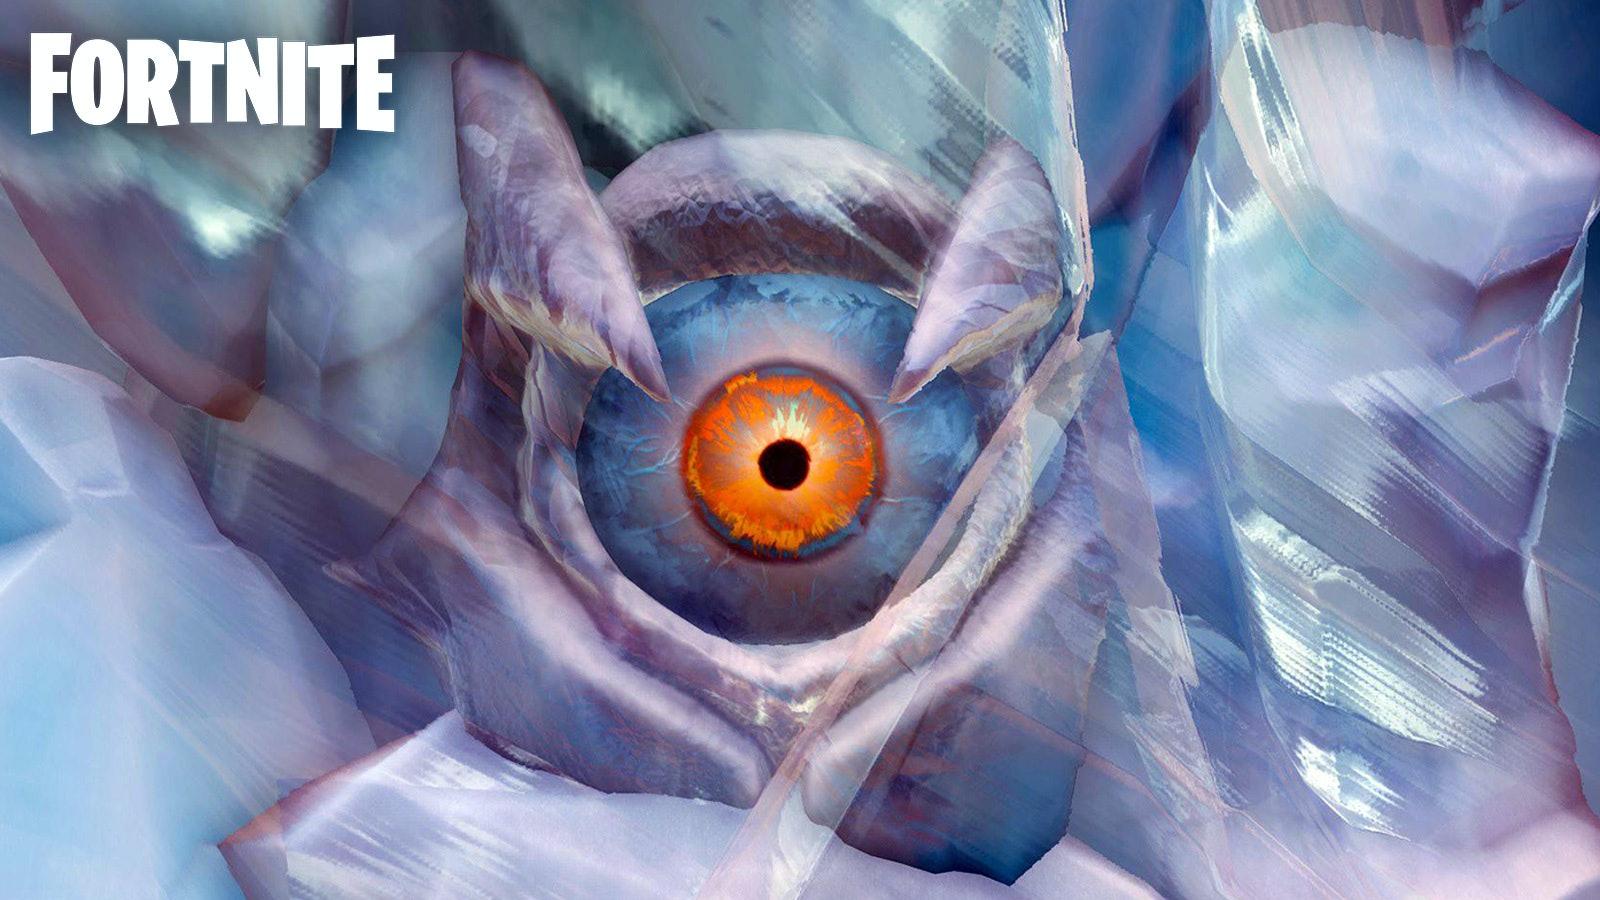 Fortnite cattus eye